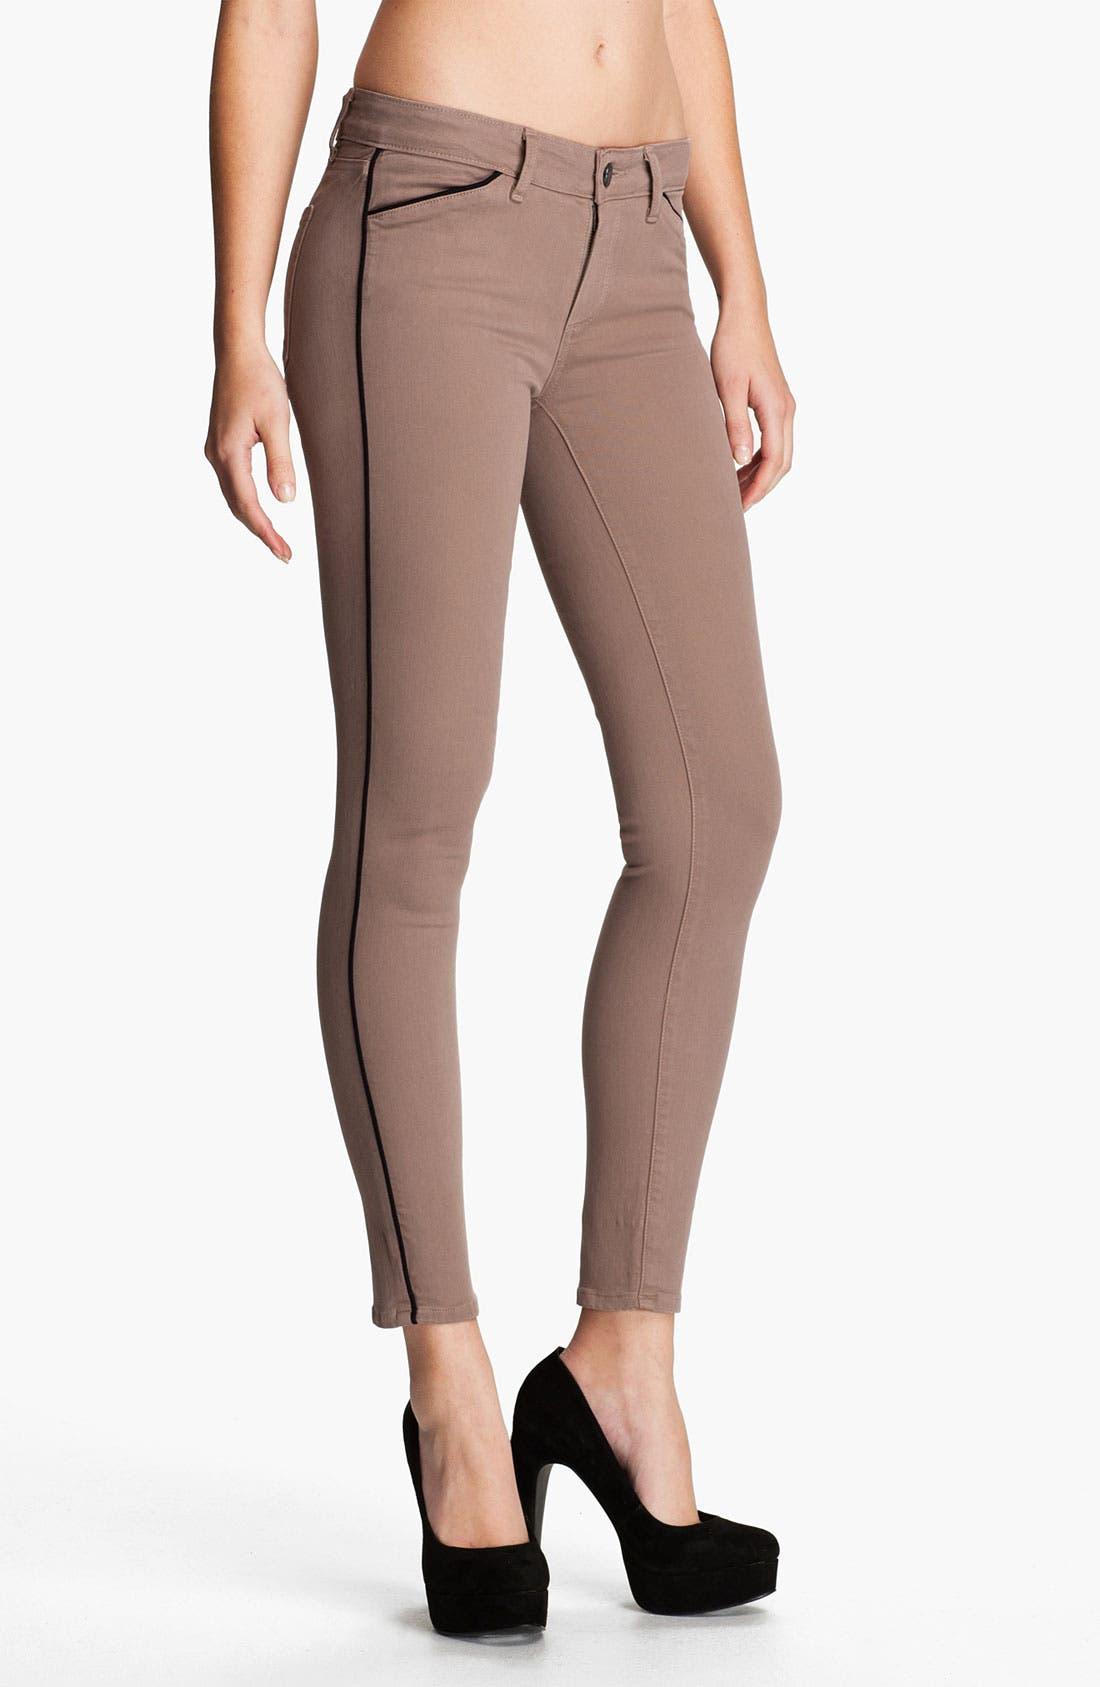 Alternate Image 1 Selected - Paige Denim 'Pipeline' Skinny Stretch Denim Jeans (Chai/Black)